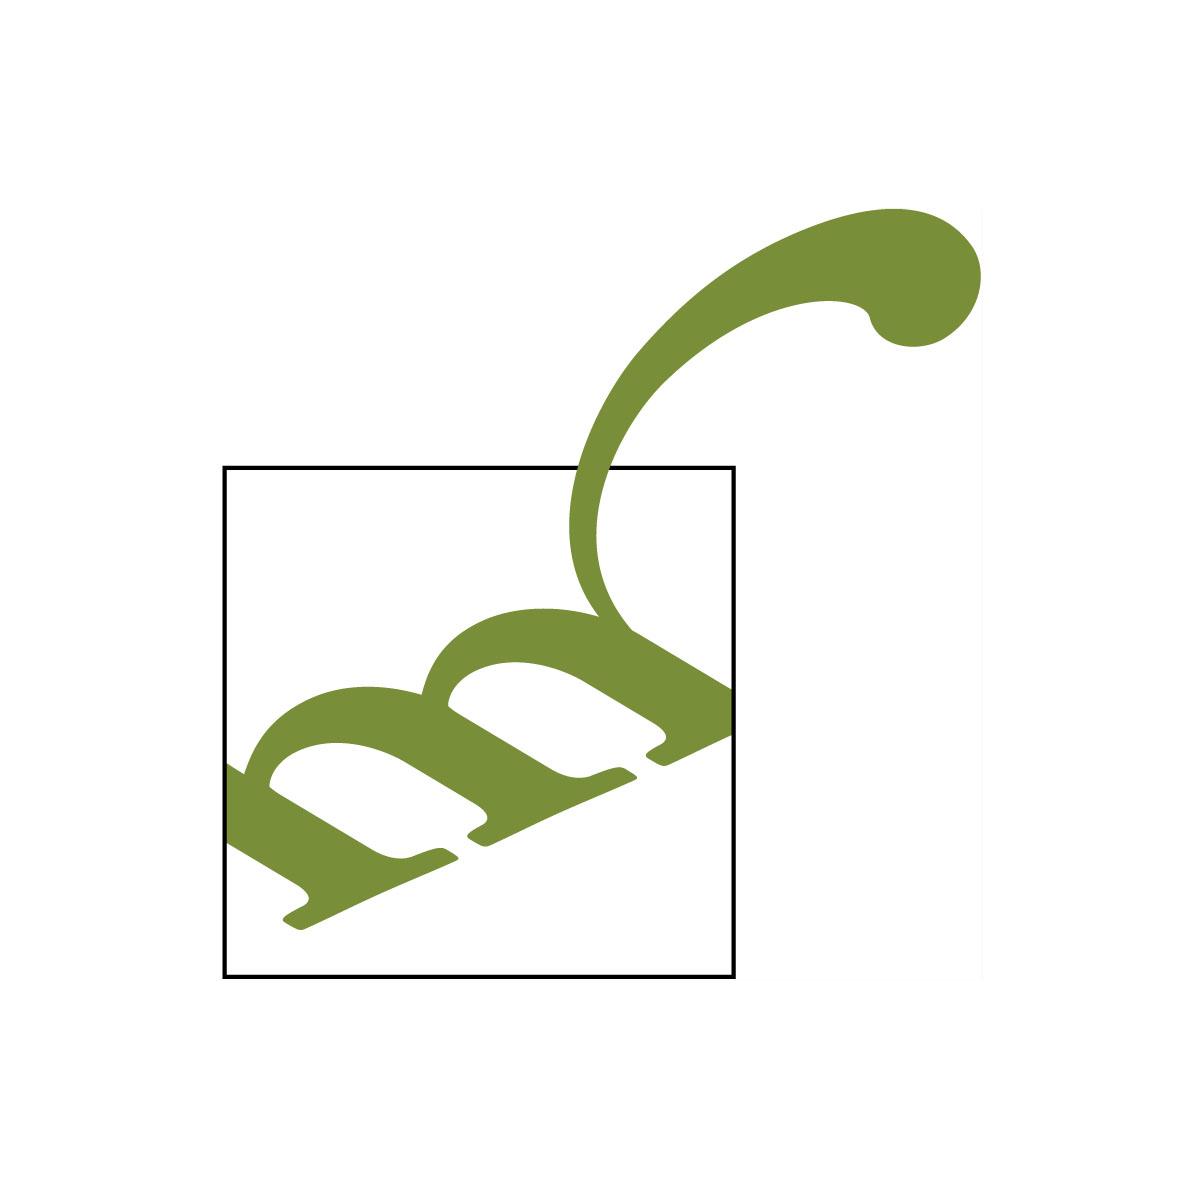 Logos-3.jpg